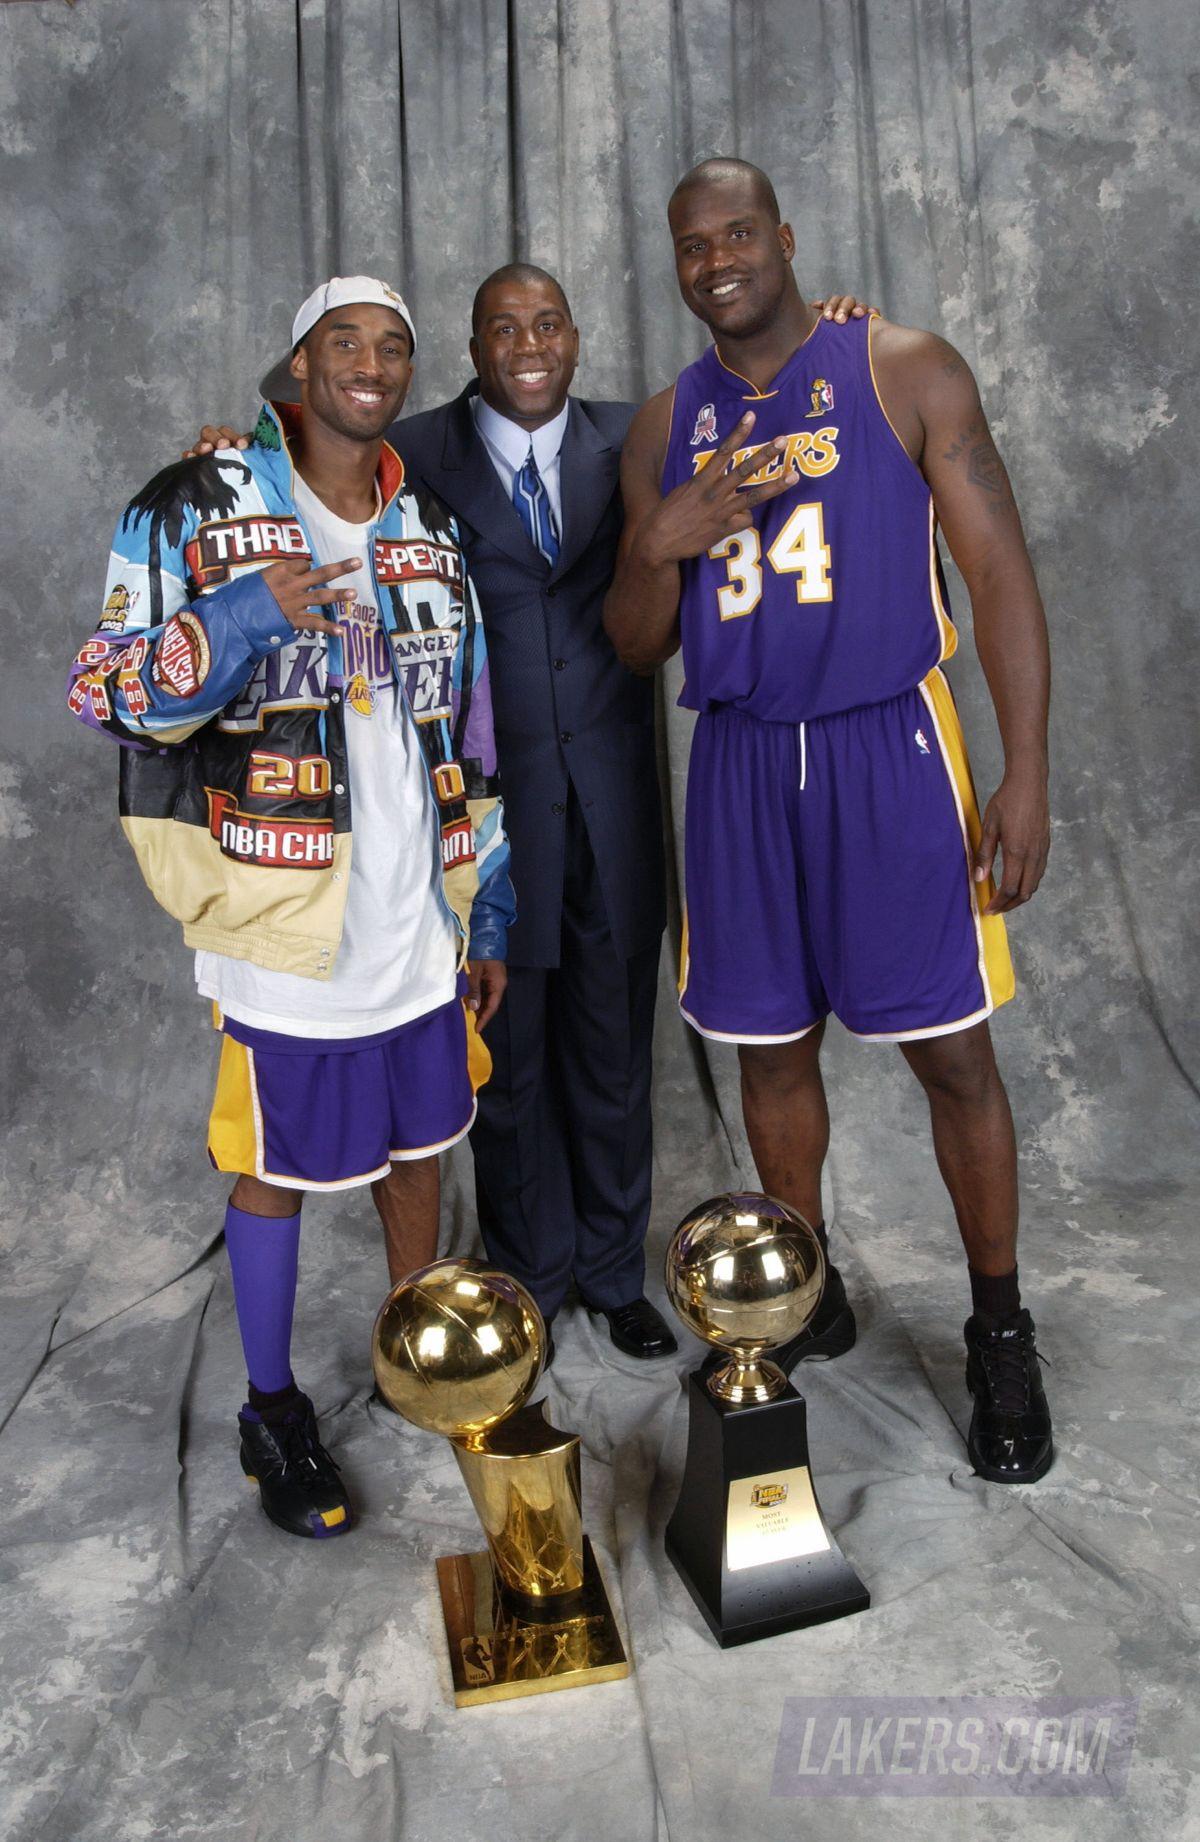 Lakers Alumni Shaquille O Neal In 2020 Shaq And Kobe Kobe Bryant Shaquille O Neal